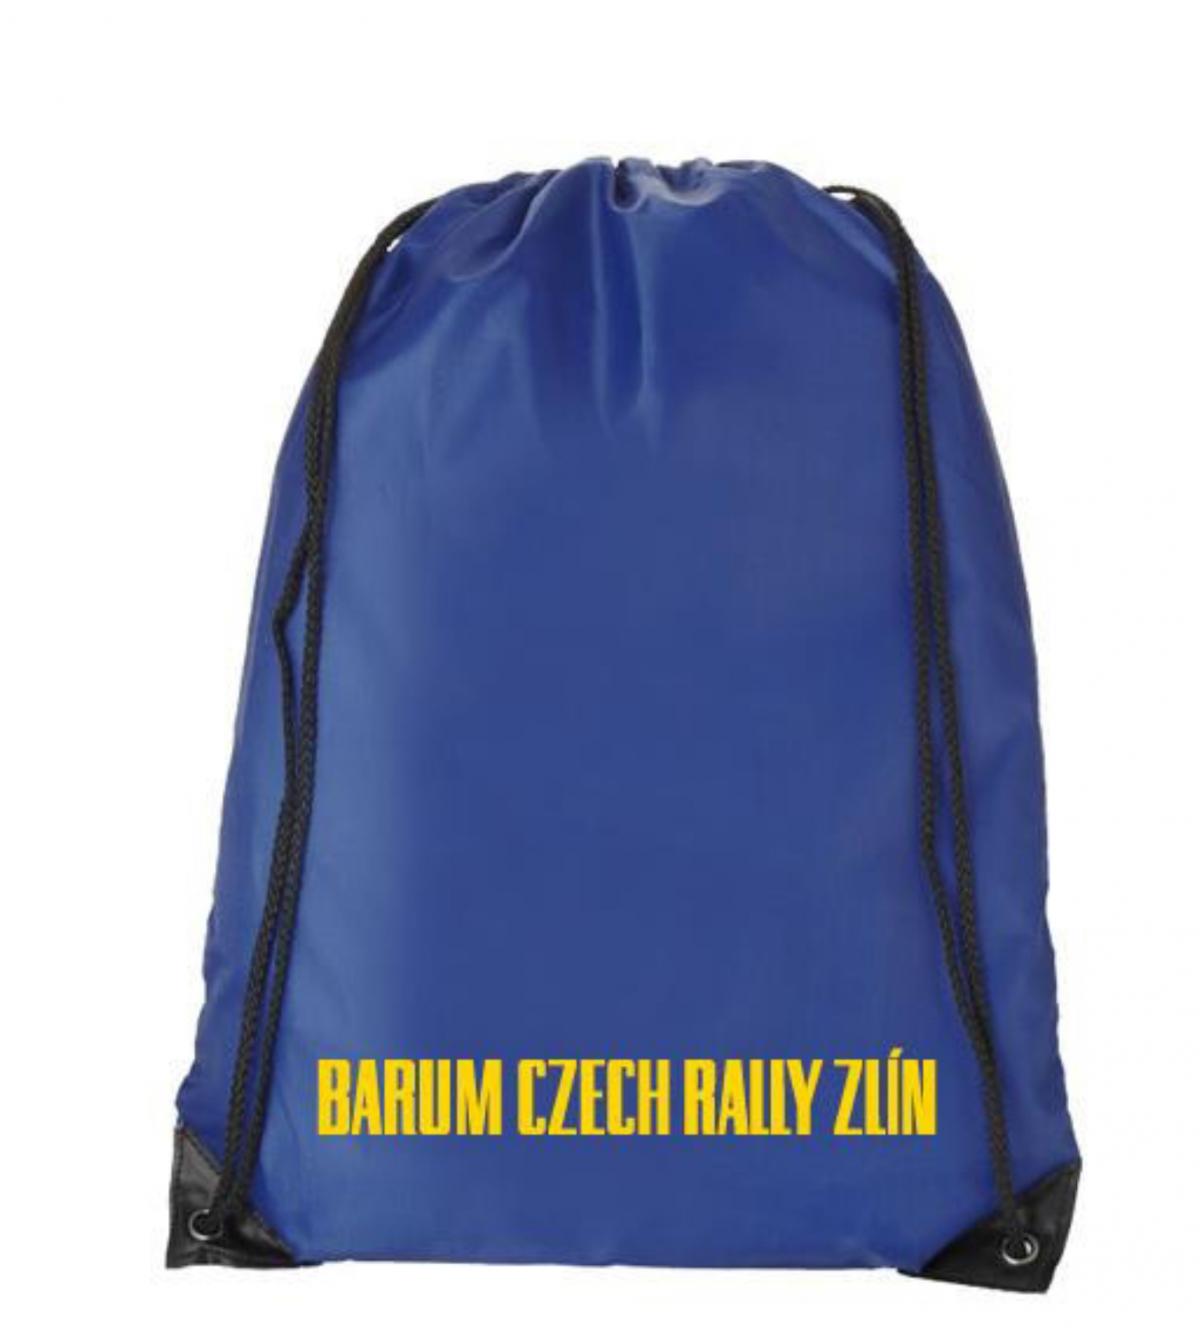 Barum Rally: Barum Czech Rally Zlín 2018